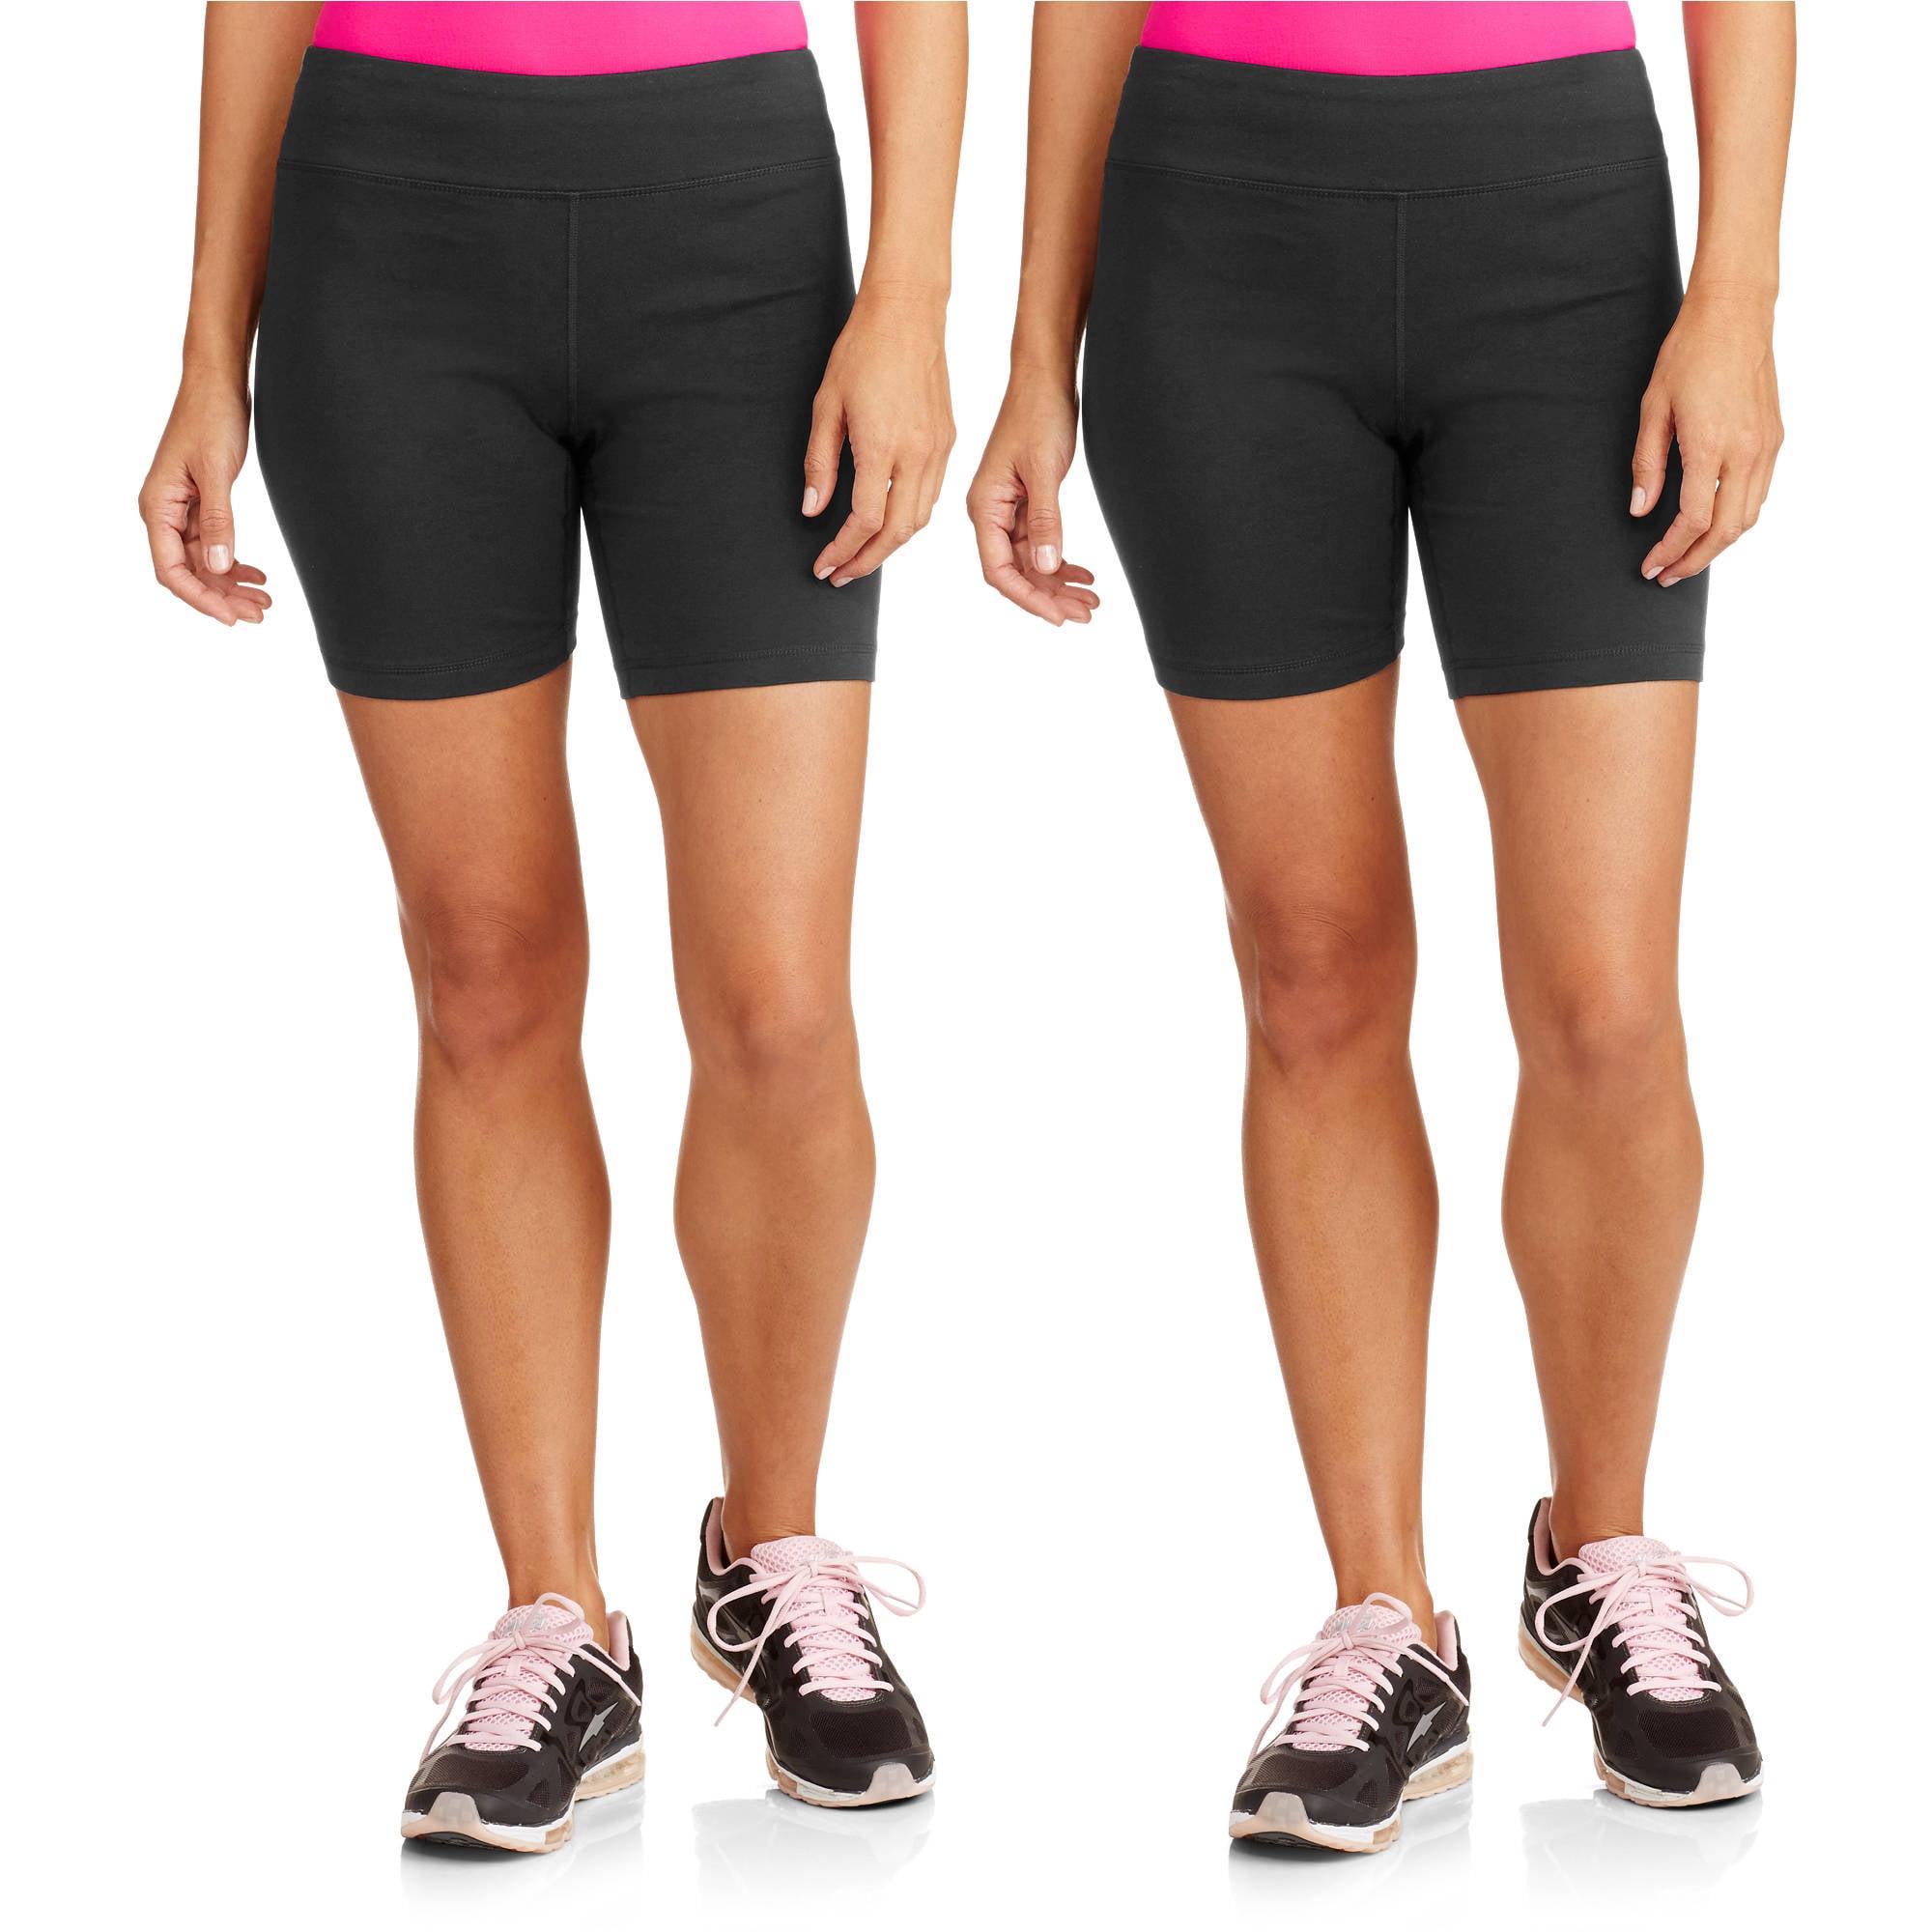 Danskin Now Women's Dri-More Core Bike Shorts, 2-Pack